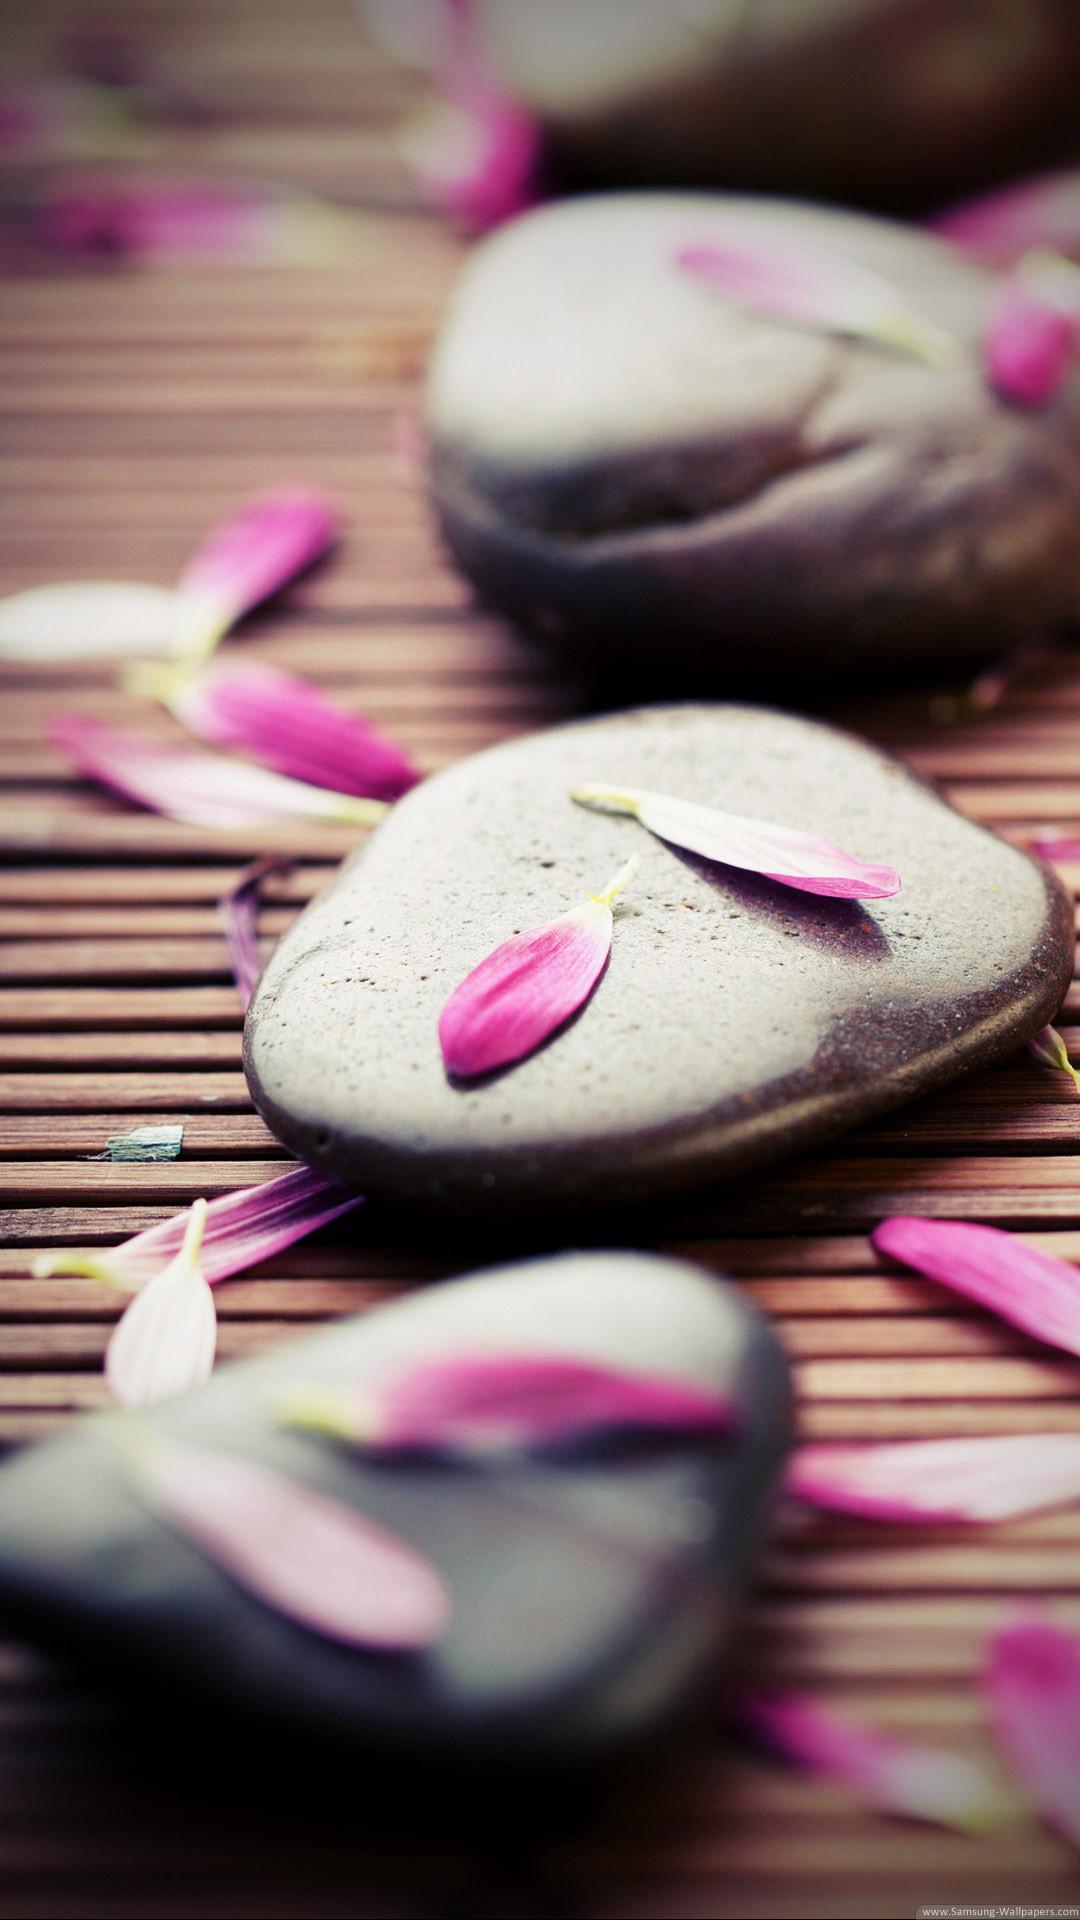 … zen stones pink petals iphone 6 plus hd wallpaper ipod wallpaper …